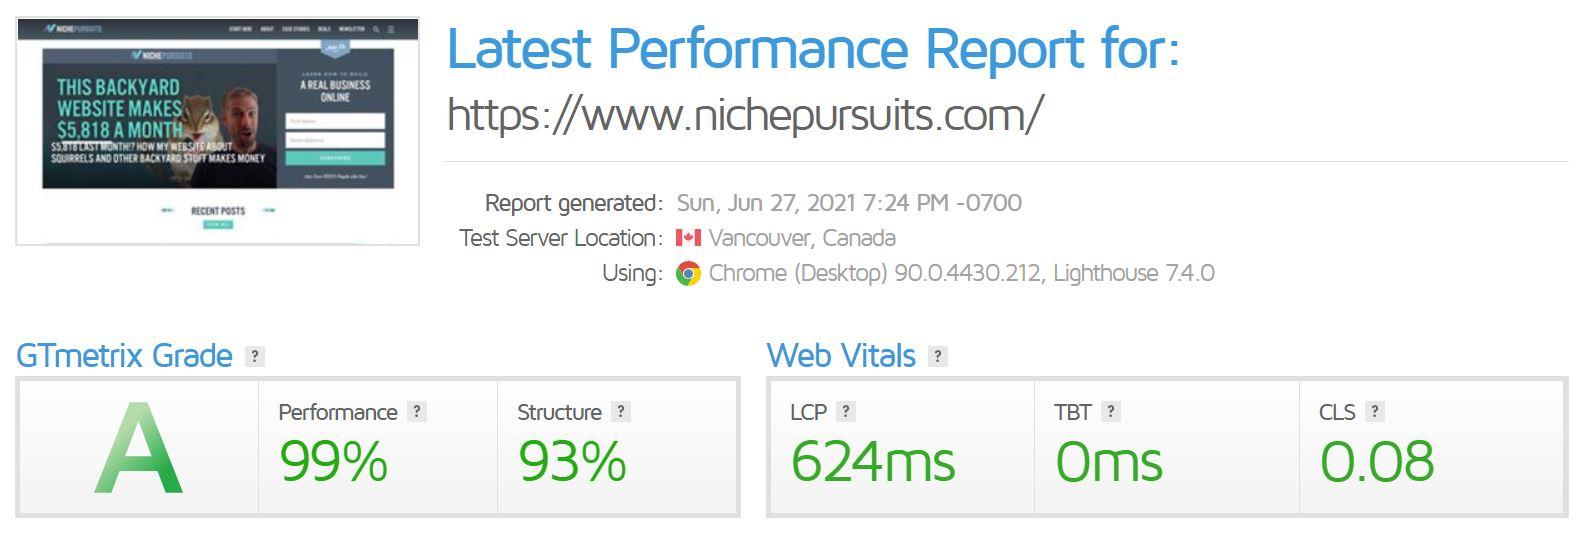 increase website page views